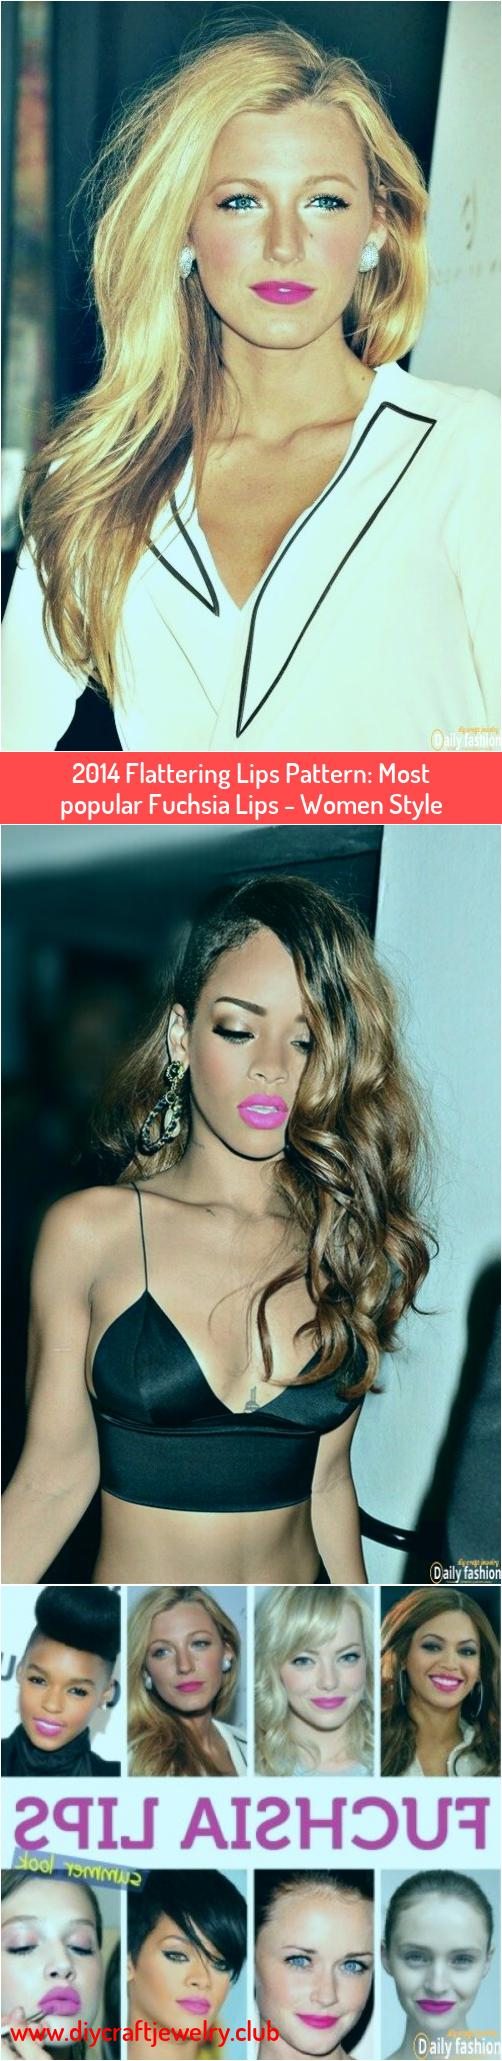 2014 Flattering Lips Pattern Most popular Fuchsia Lips